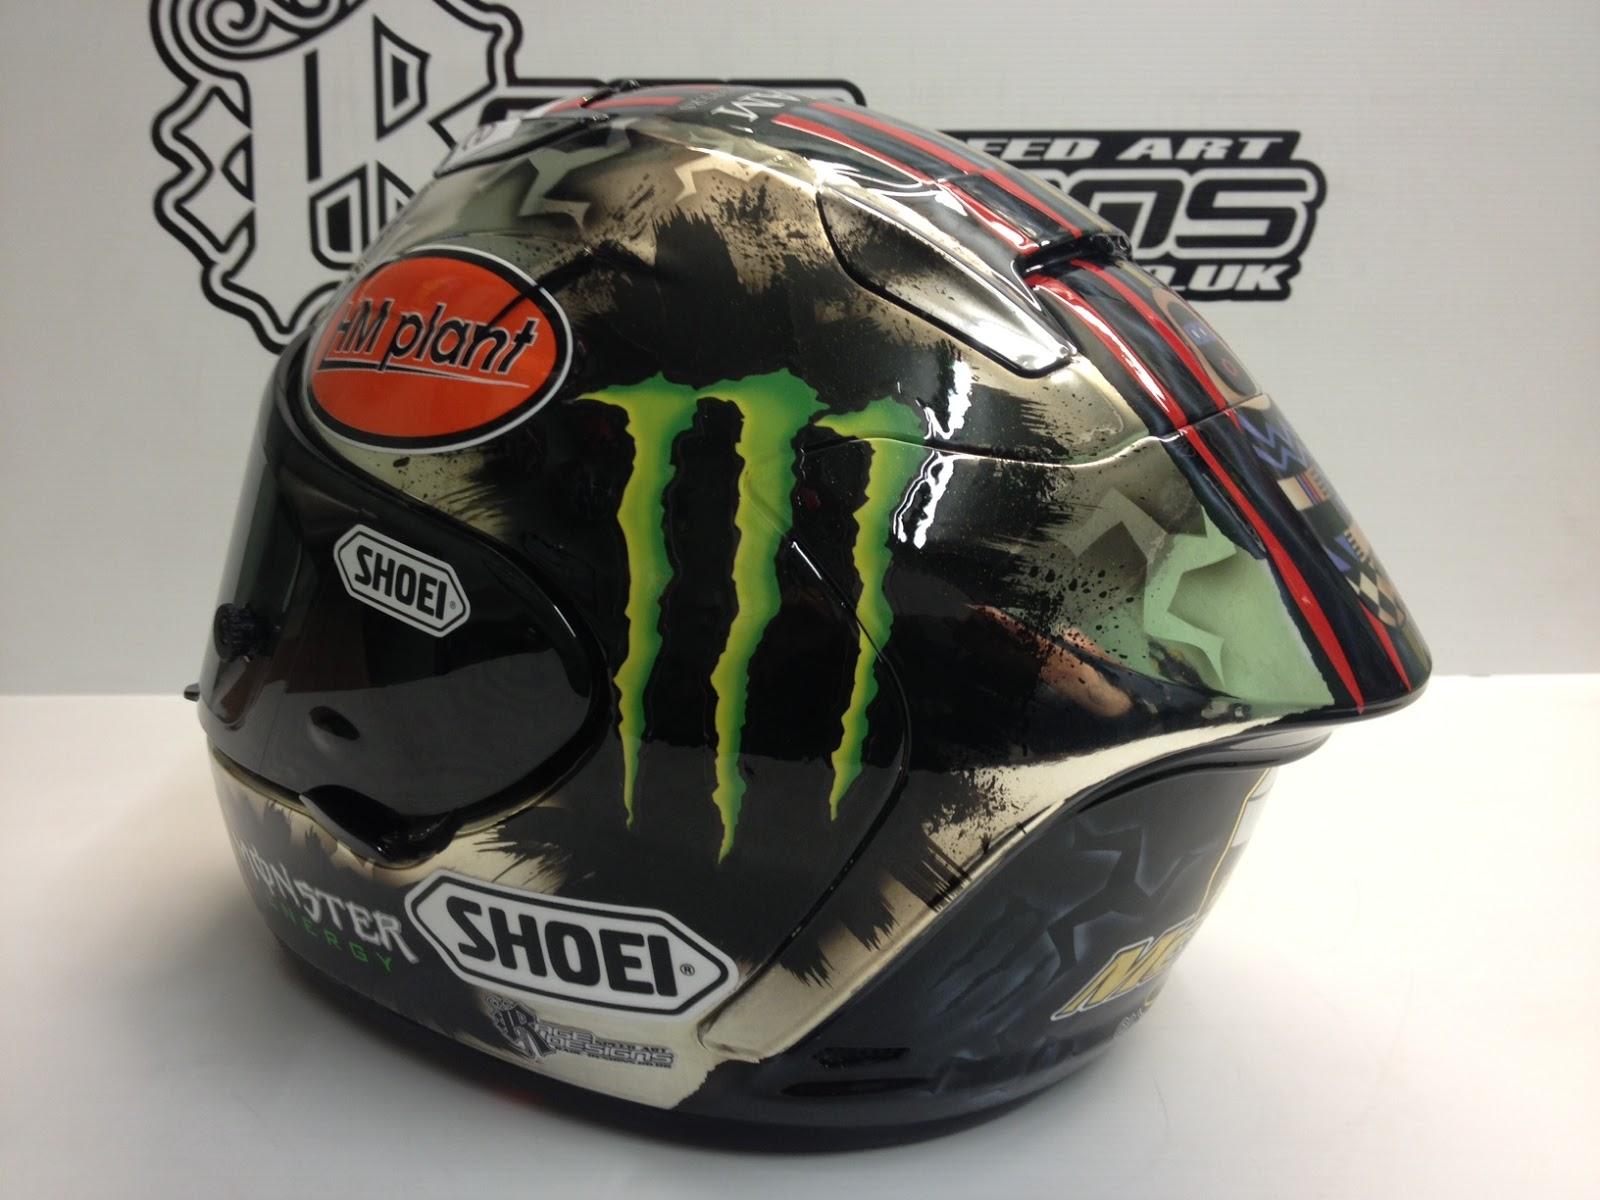 racing helmets garage shoei x spirit ii j mcguinness iomtt 2013 by rage designs. Black Bedroom Furniture Sets. Home Design Ideas